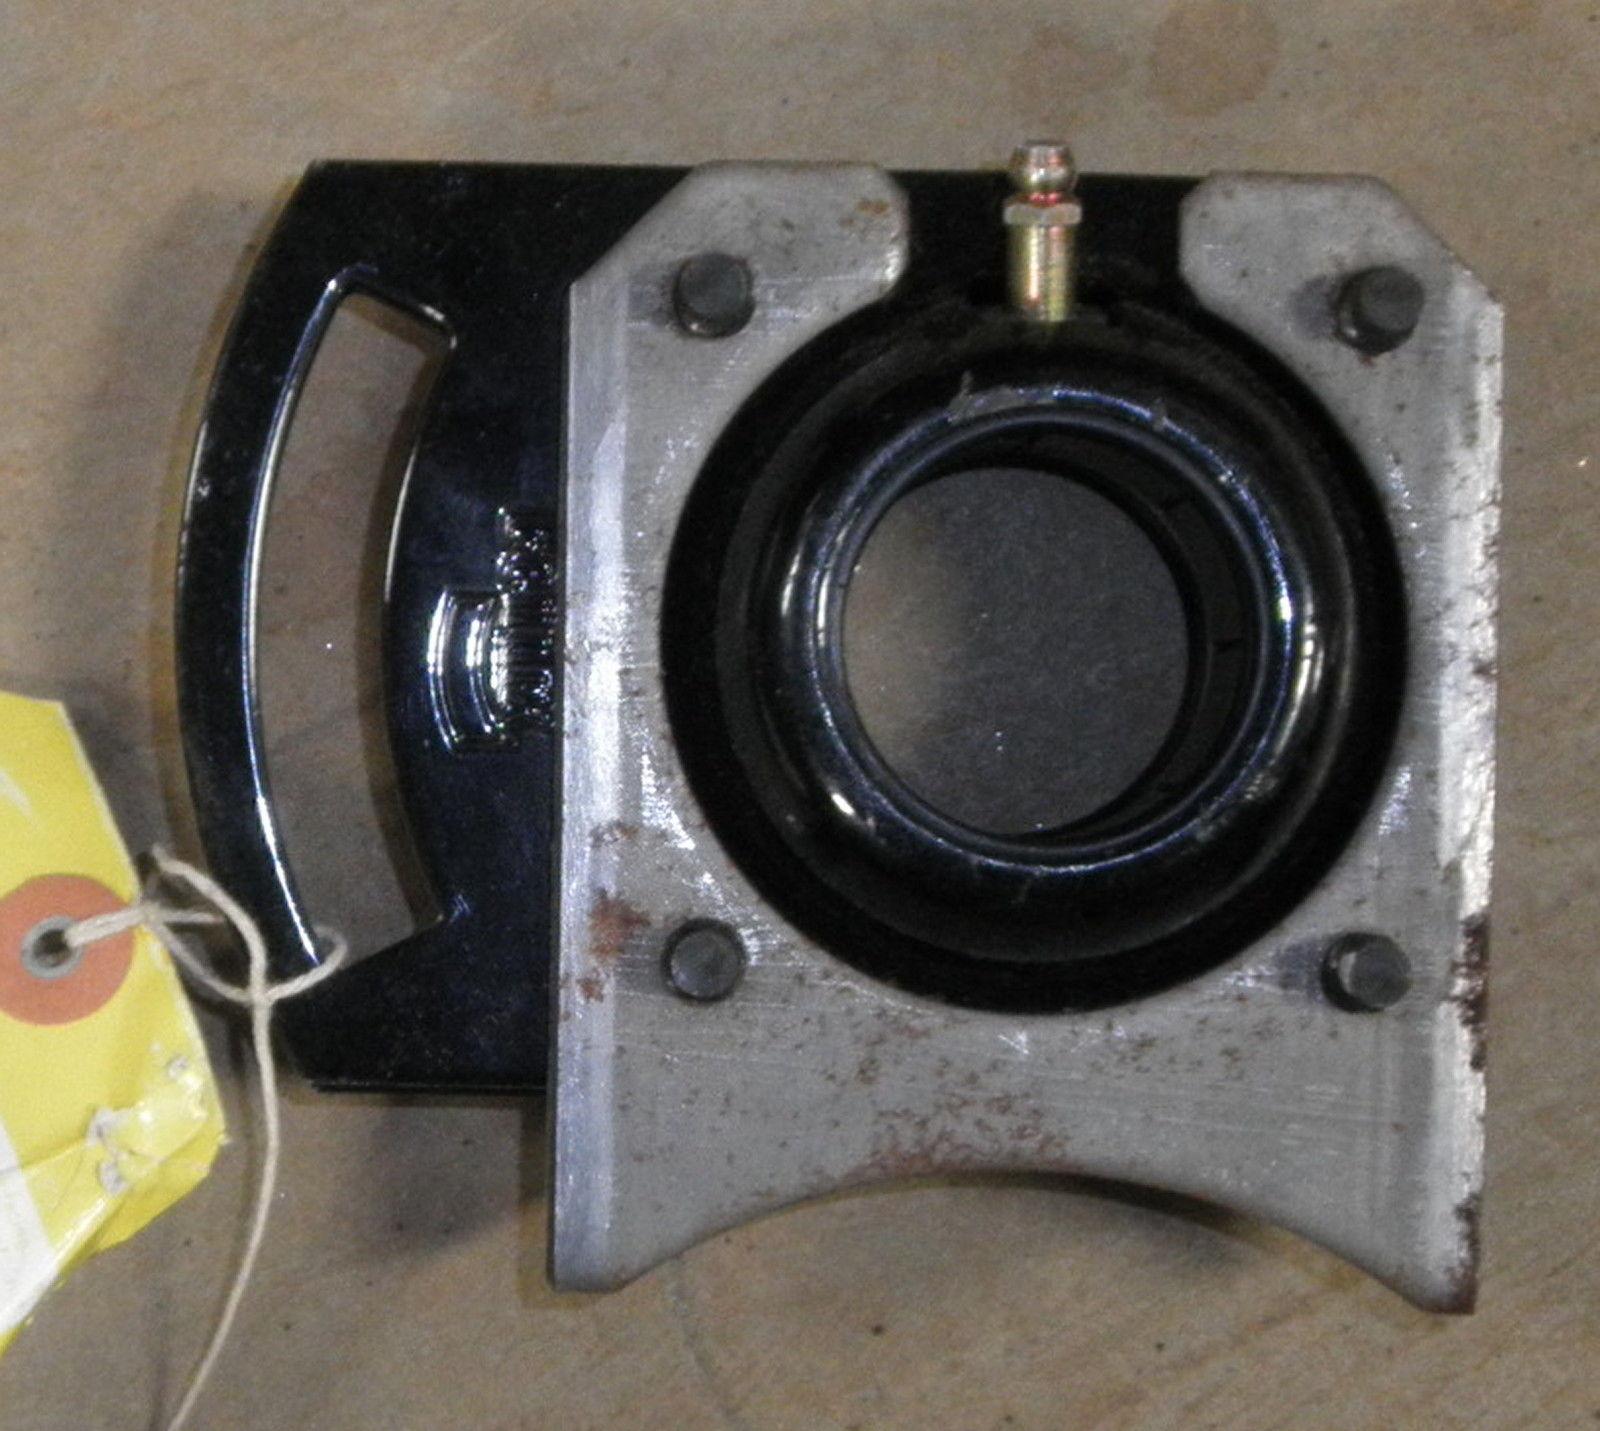 Steel Sleeve Bushing Brake Shoe Anchnor Pin 577650C1 3120-00-255-6042